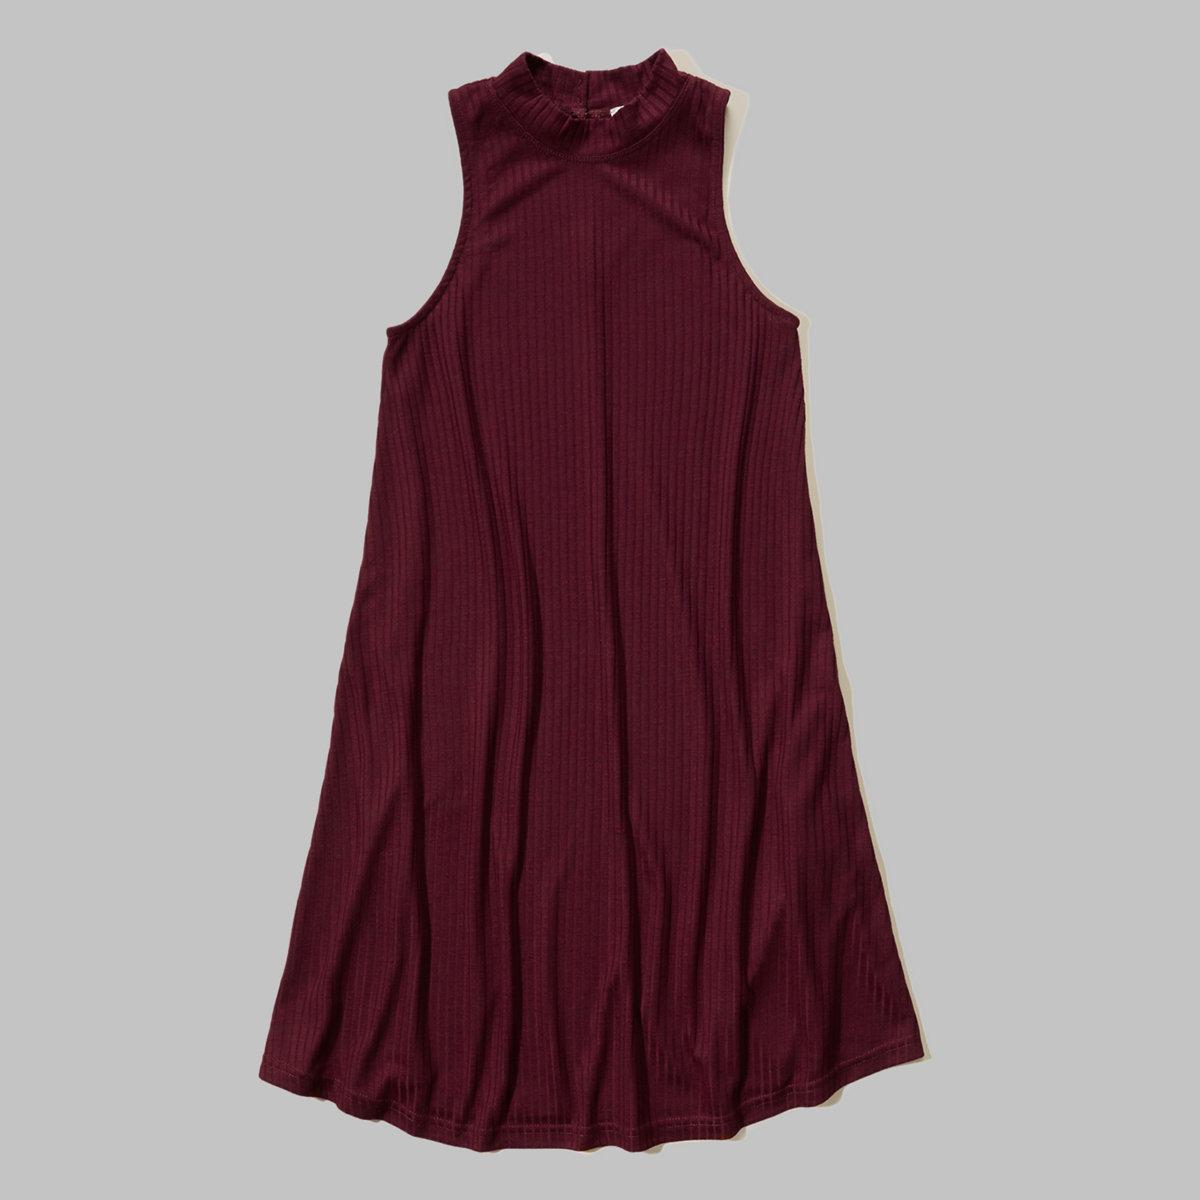 Ribbed Mock Neck Swing Dress